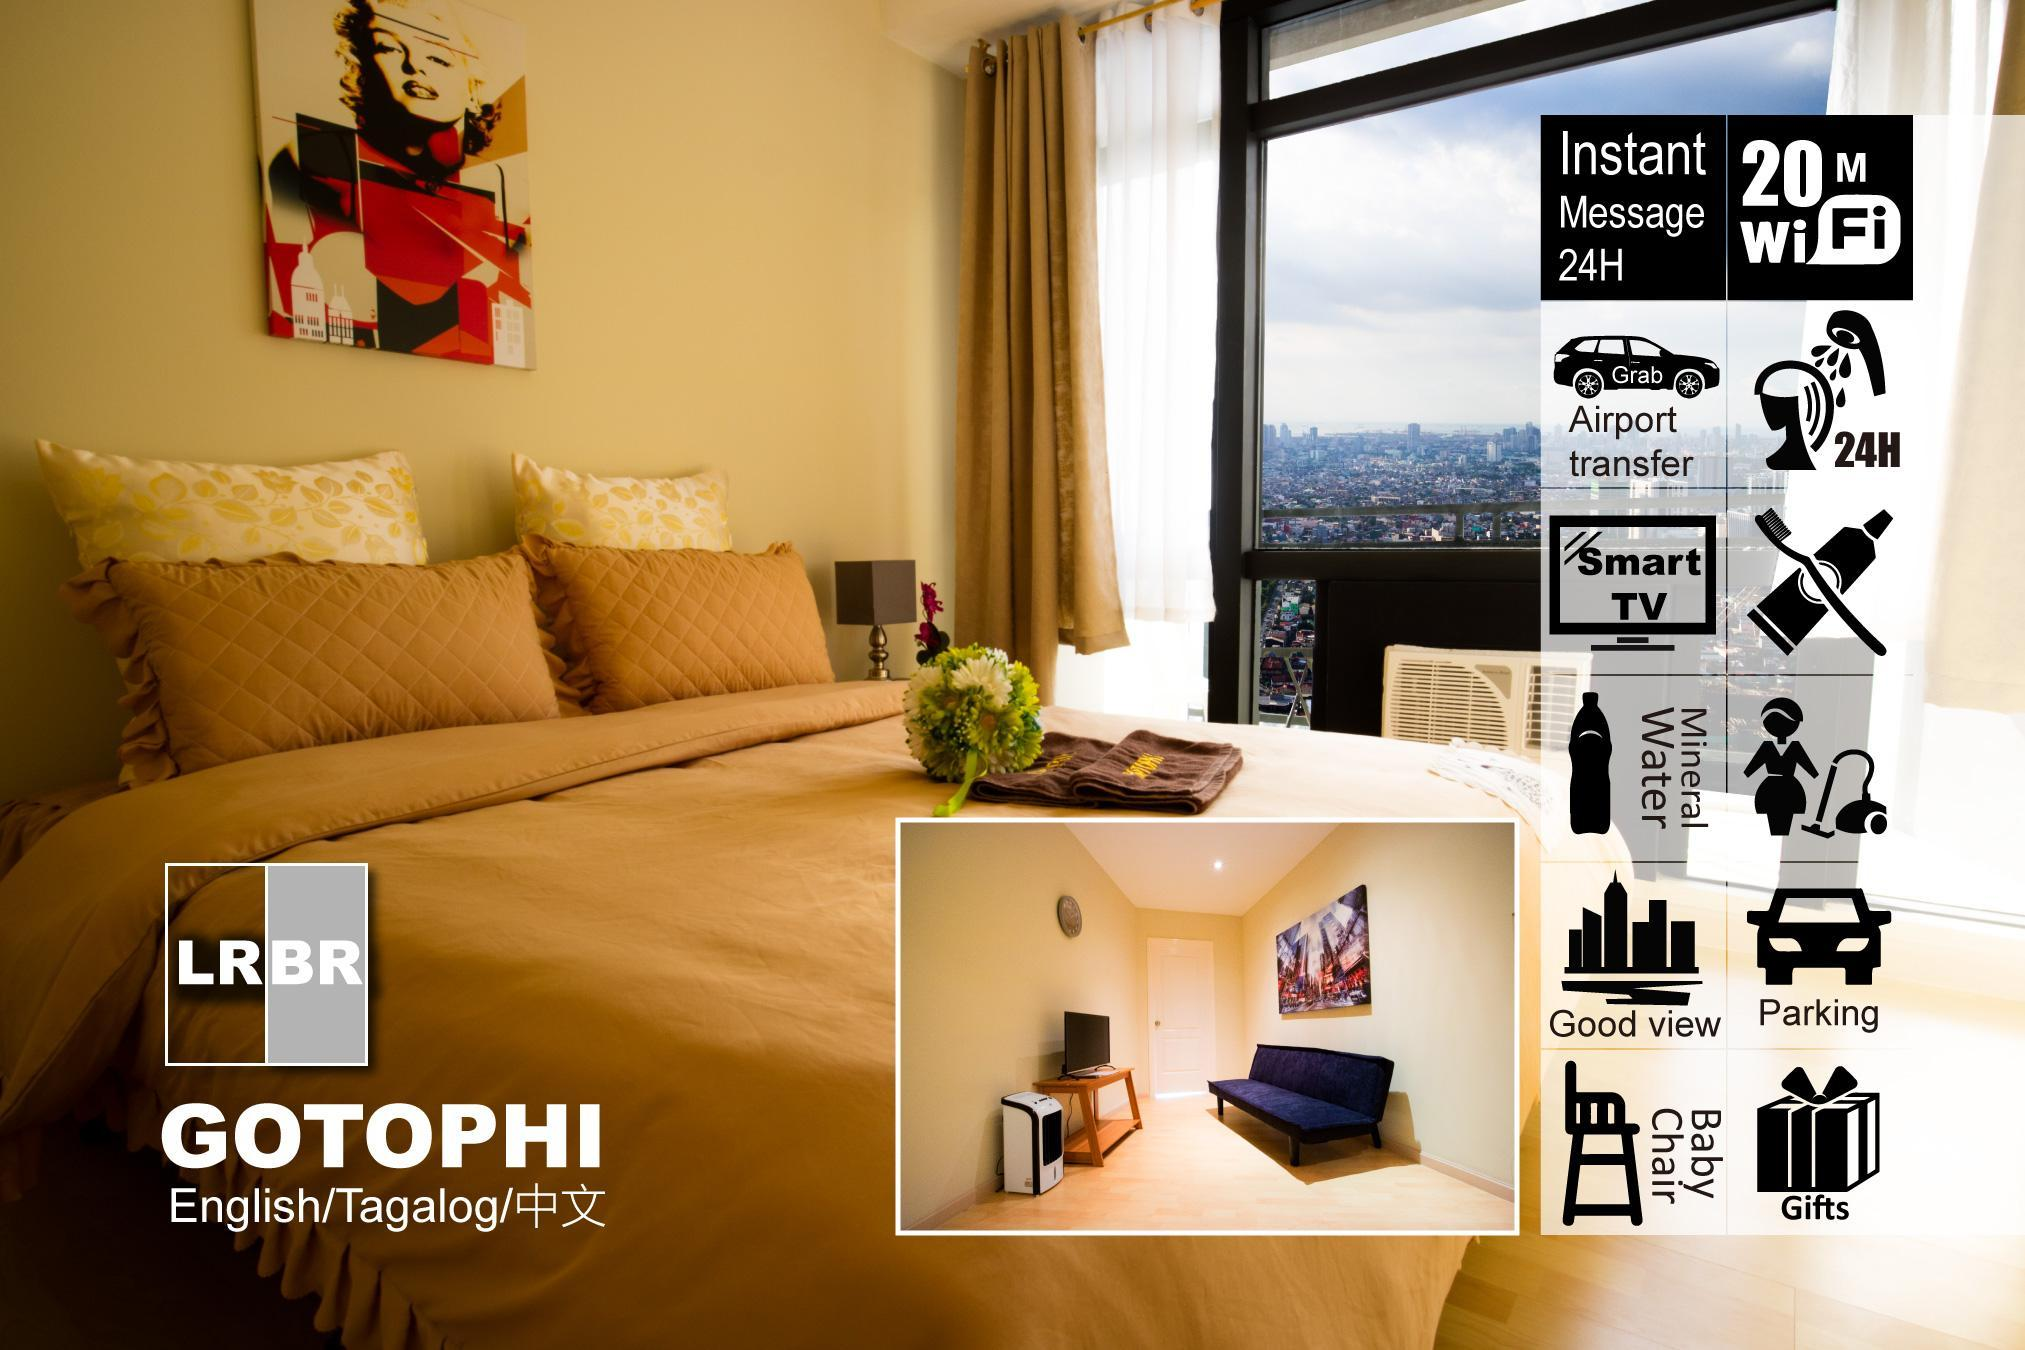 Gotophi Luxurious 5Star Hotel 1BR Gramercy 5709